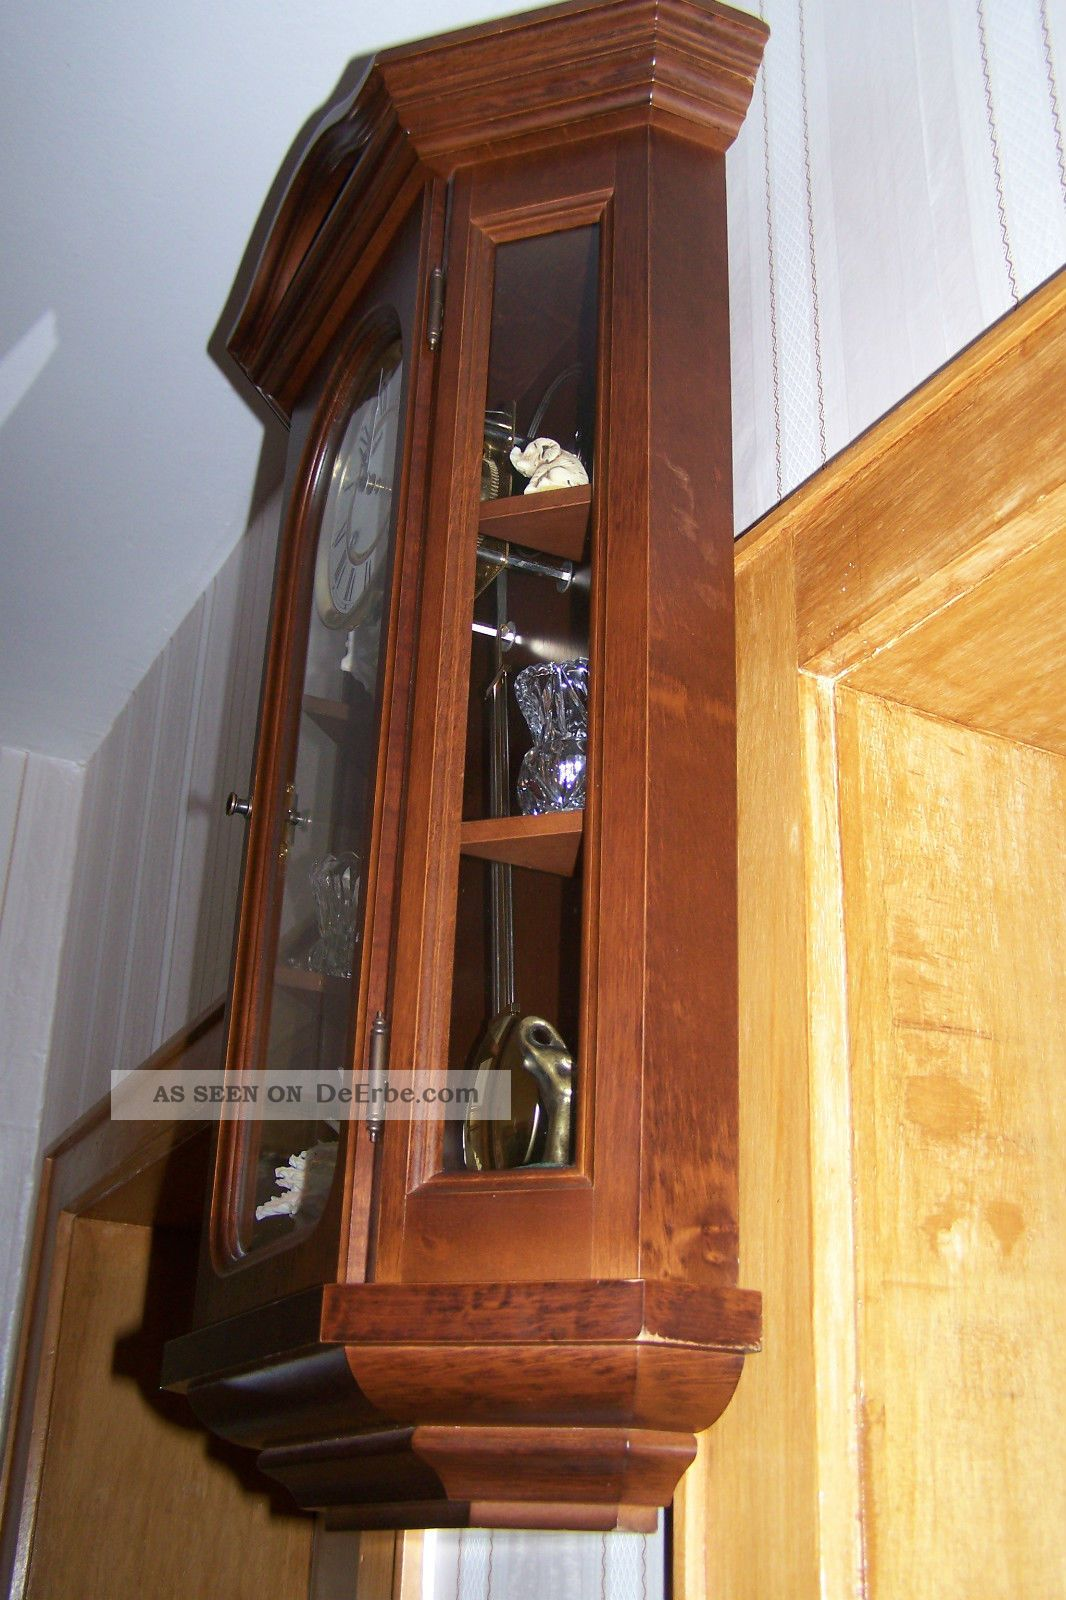 sch ne klassische wandpendeluhr hermle aus holz osterley. Black Bedroom Furniture Sets. Home Design Ideas